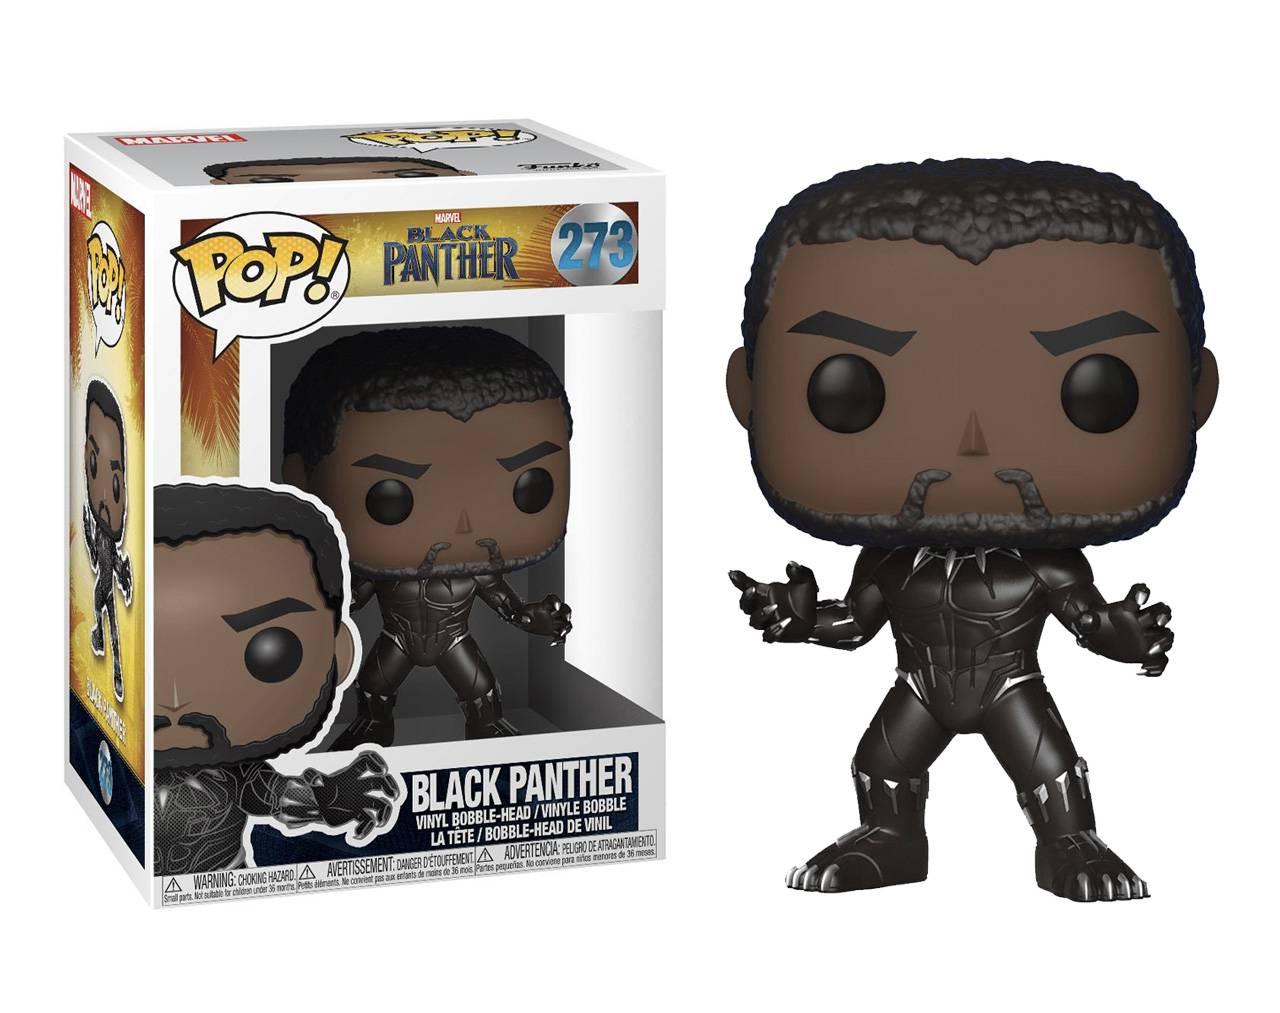 Black Panther Pop! Vinyl